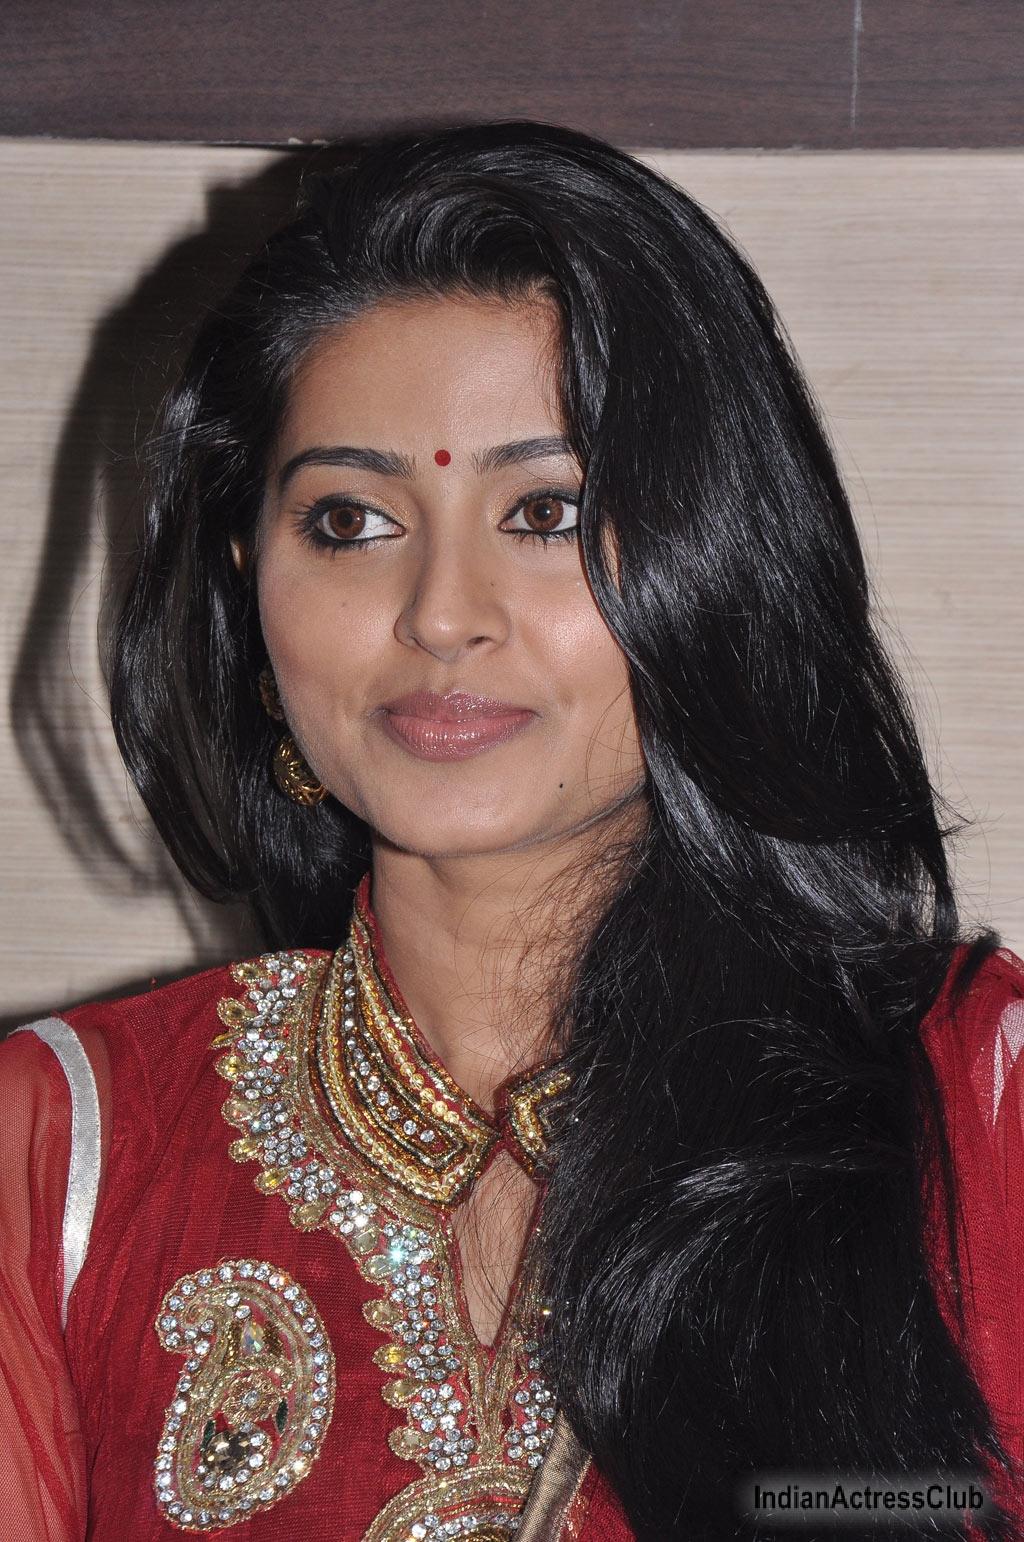 Bhavana indian actress hot video indianmasalaclipsnet - 2 2